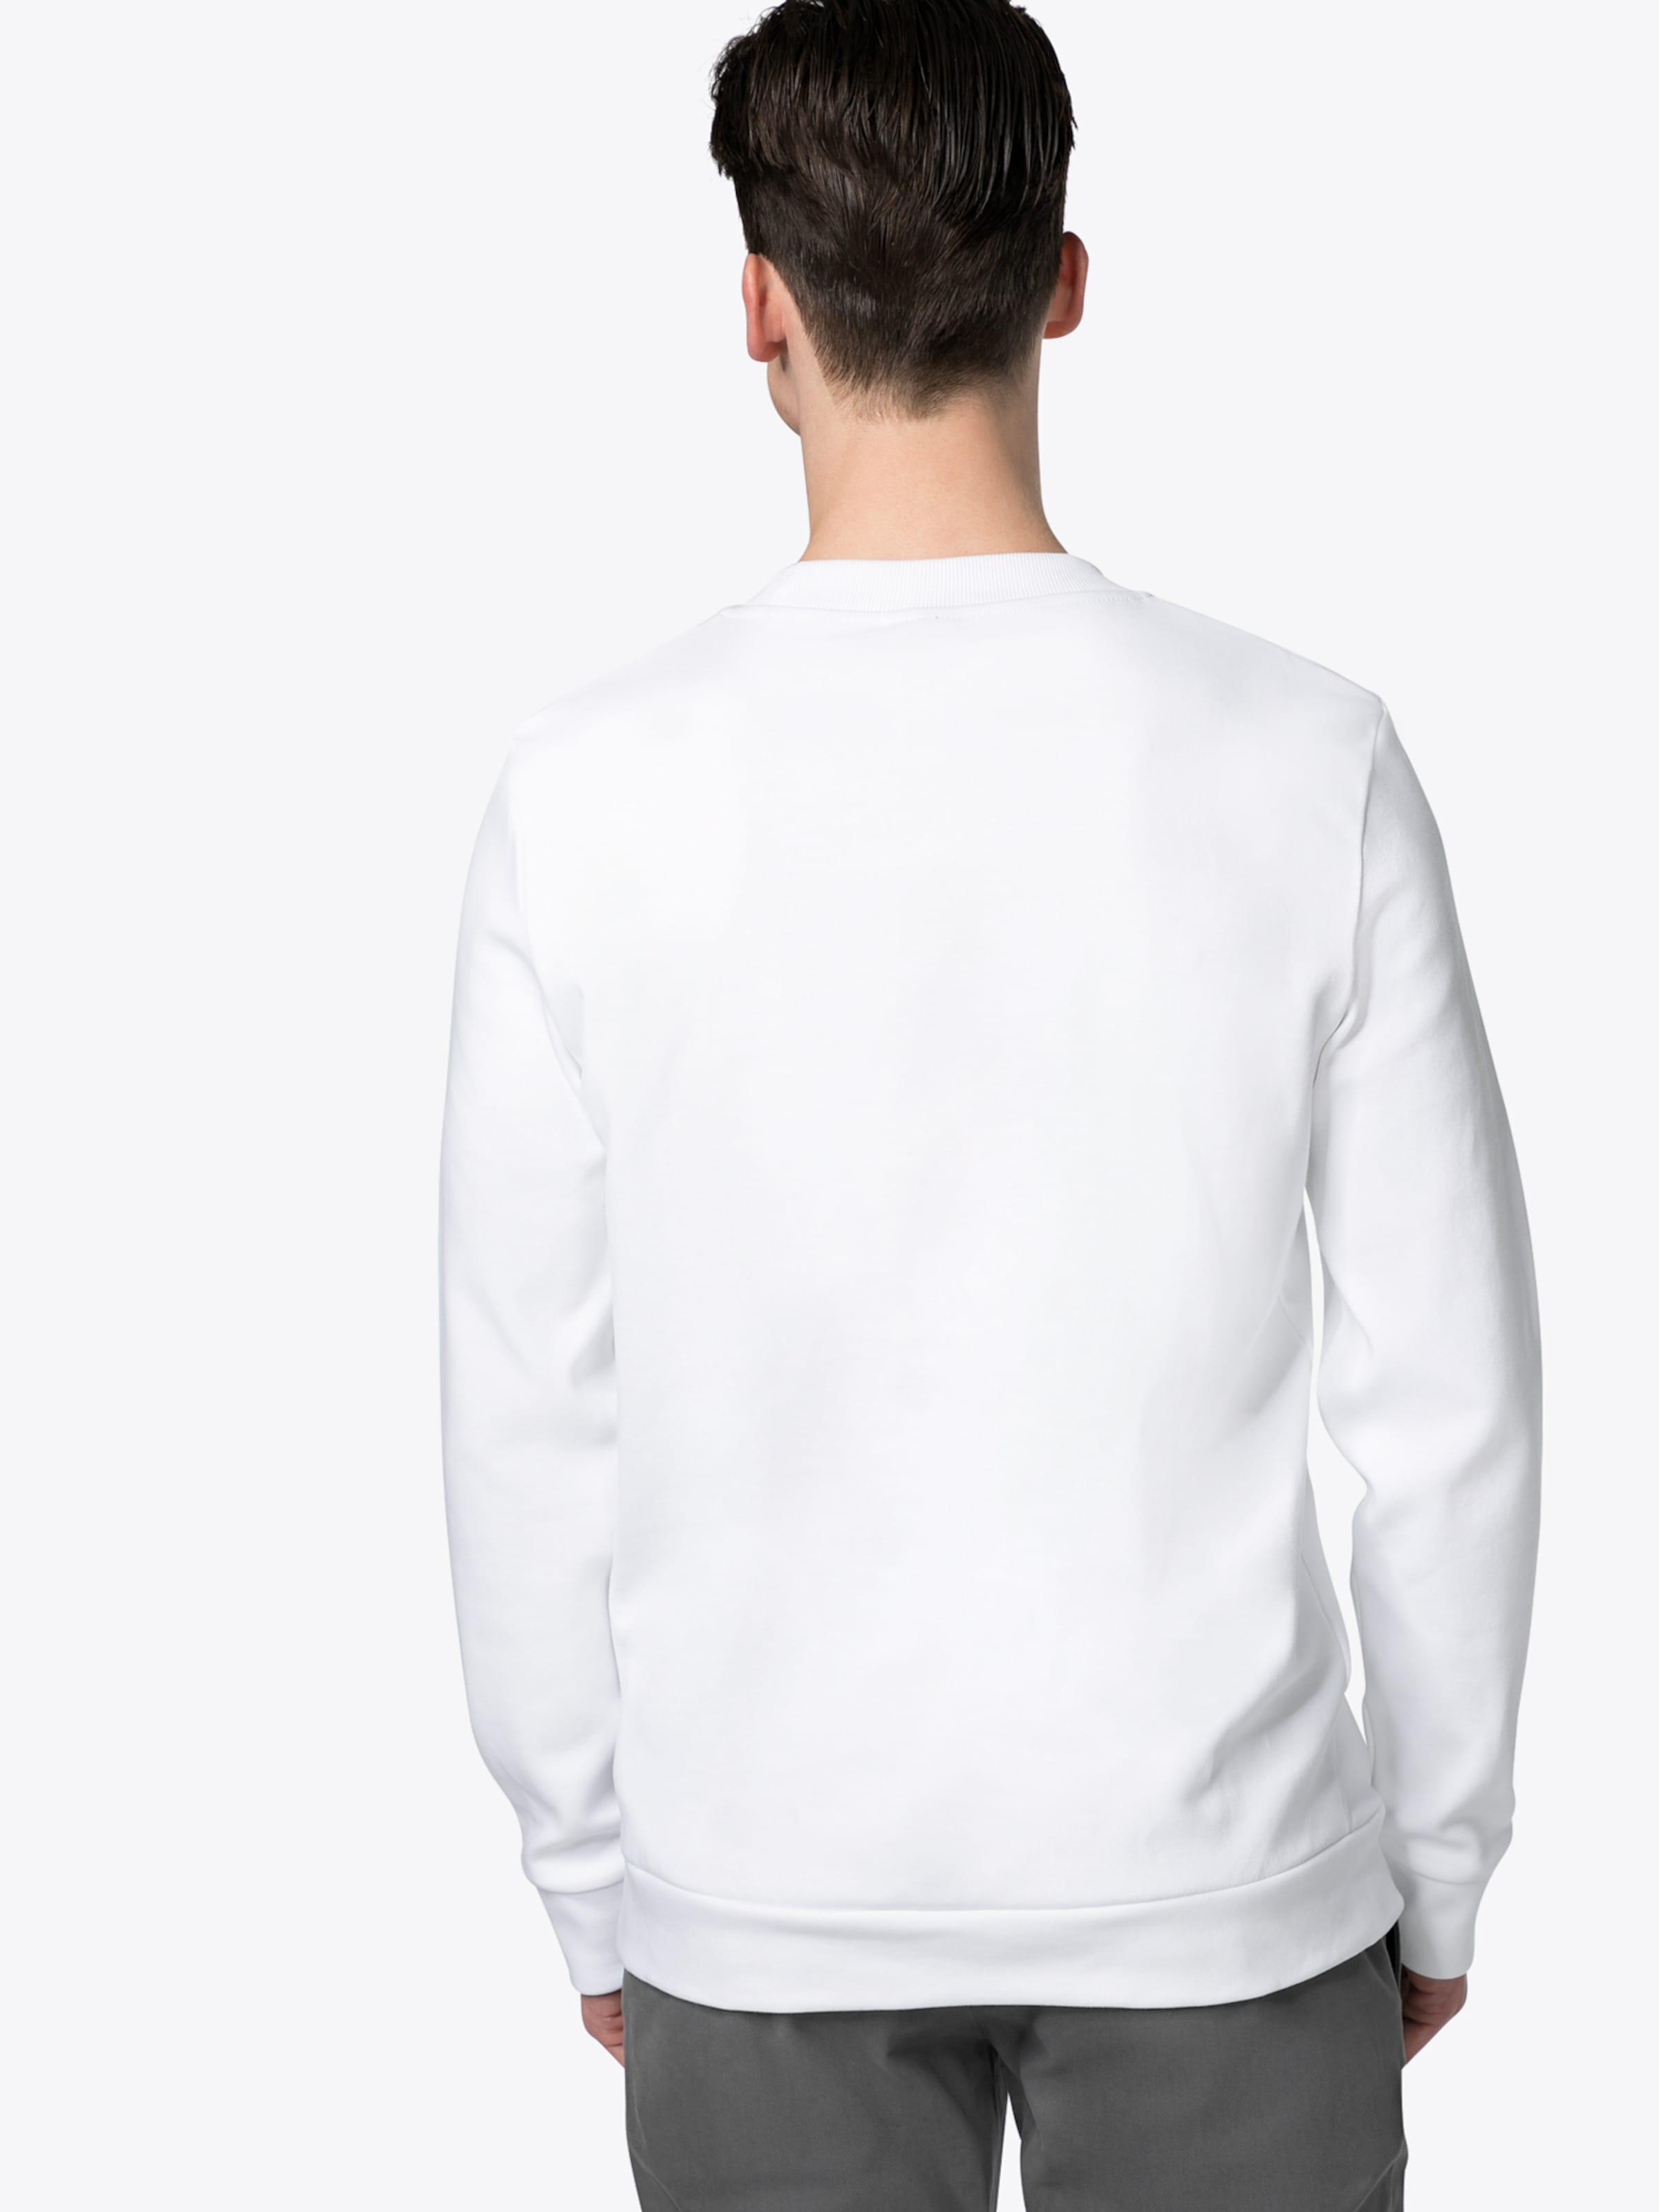 JoopSweatshirt JoopSweatshirt 'alfred' In 'alfred' SchwarzWeiß 5LR4j3Aq